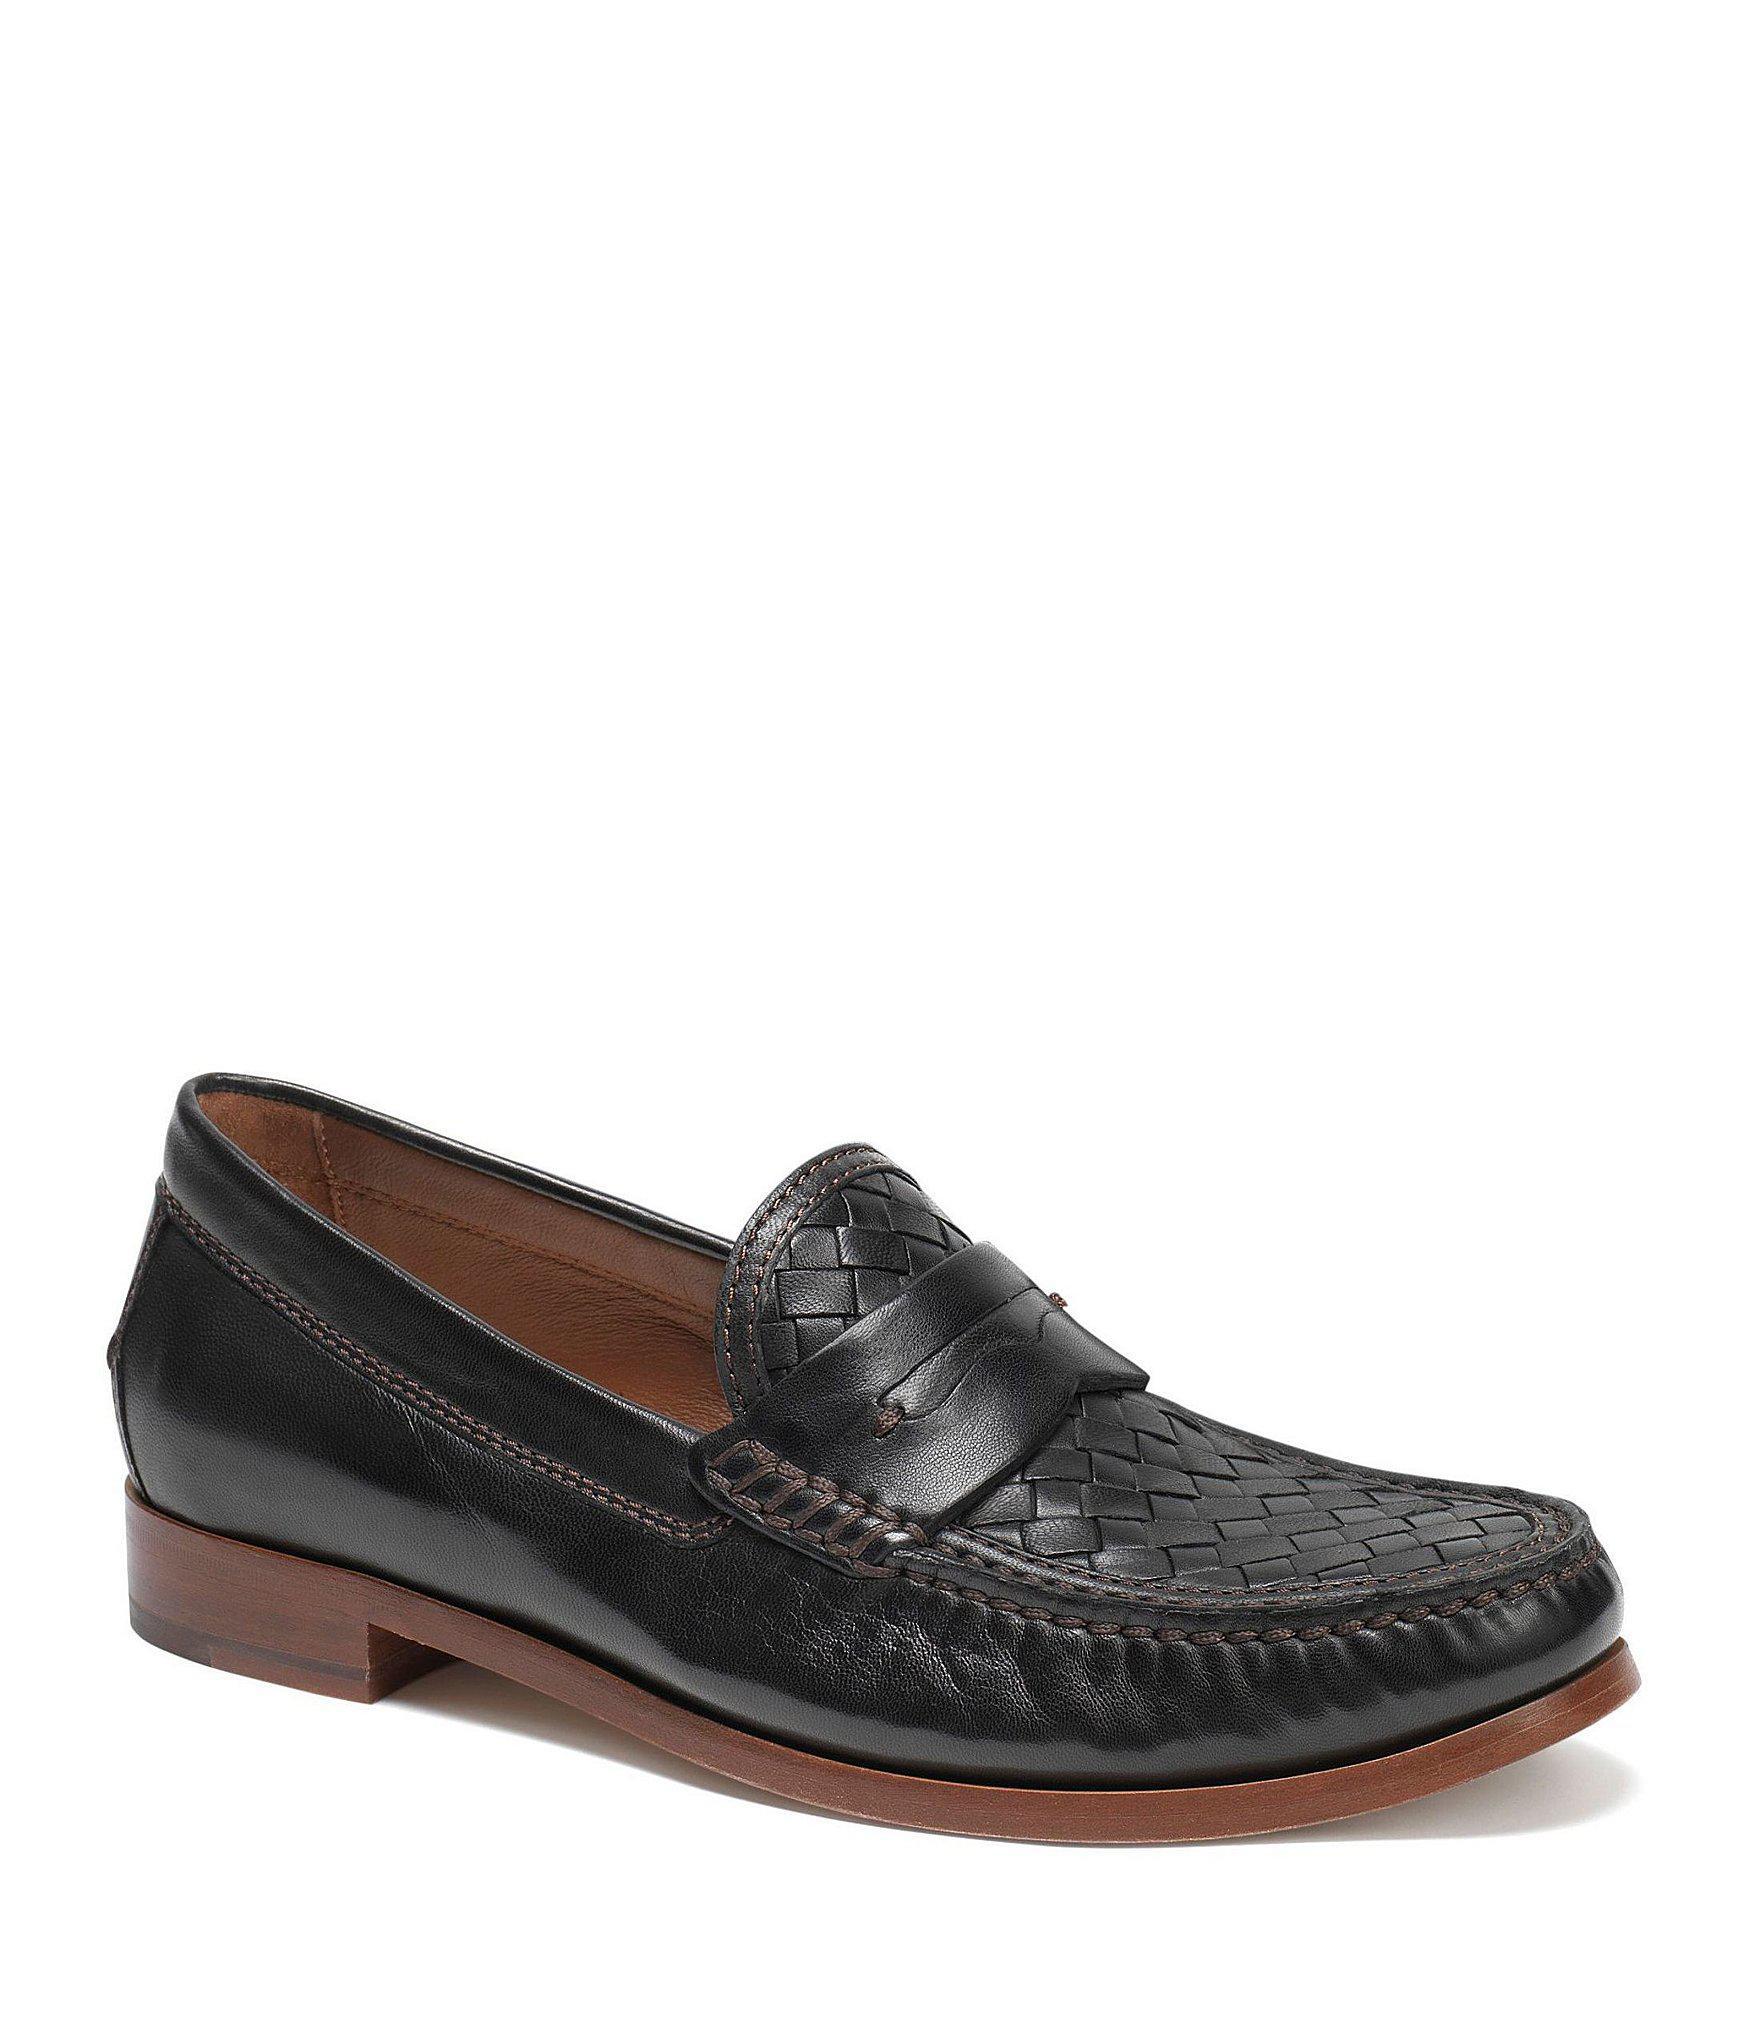 738301d75f1 Lyst - Trask Men s Slade Woven Loafers in Black for Men